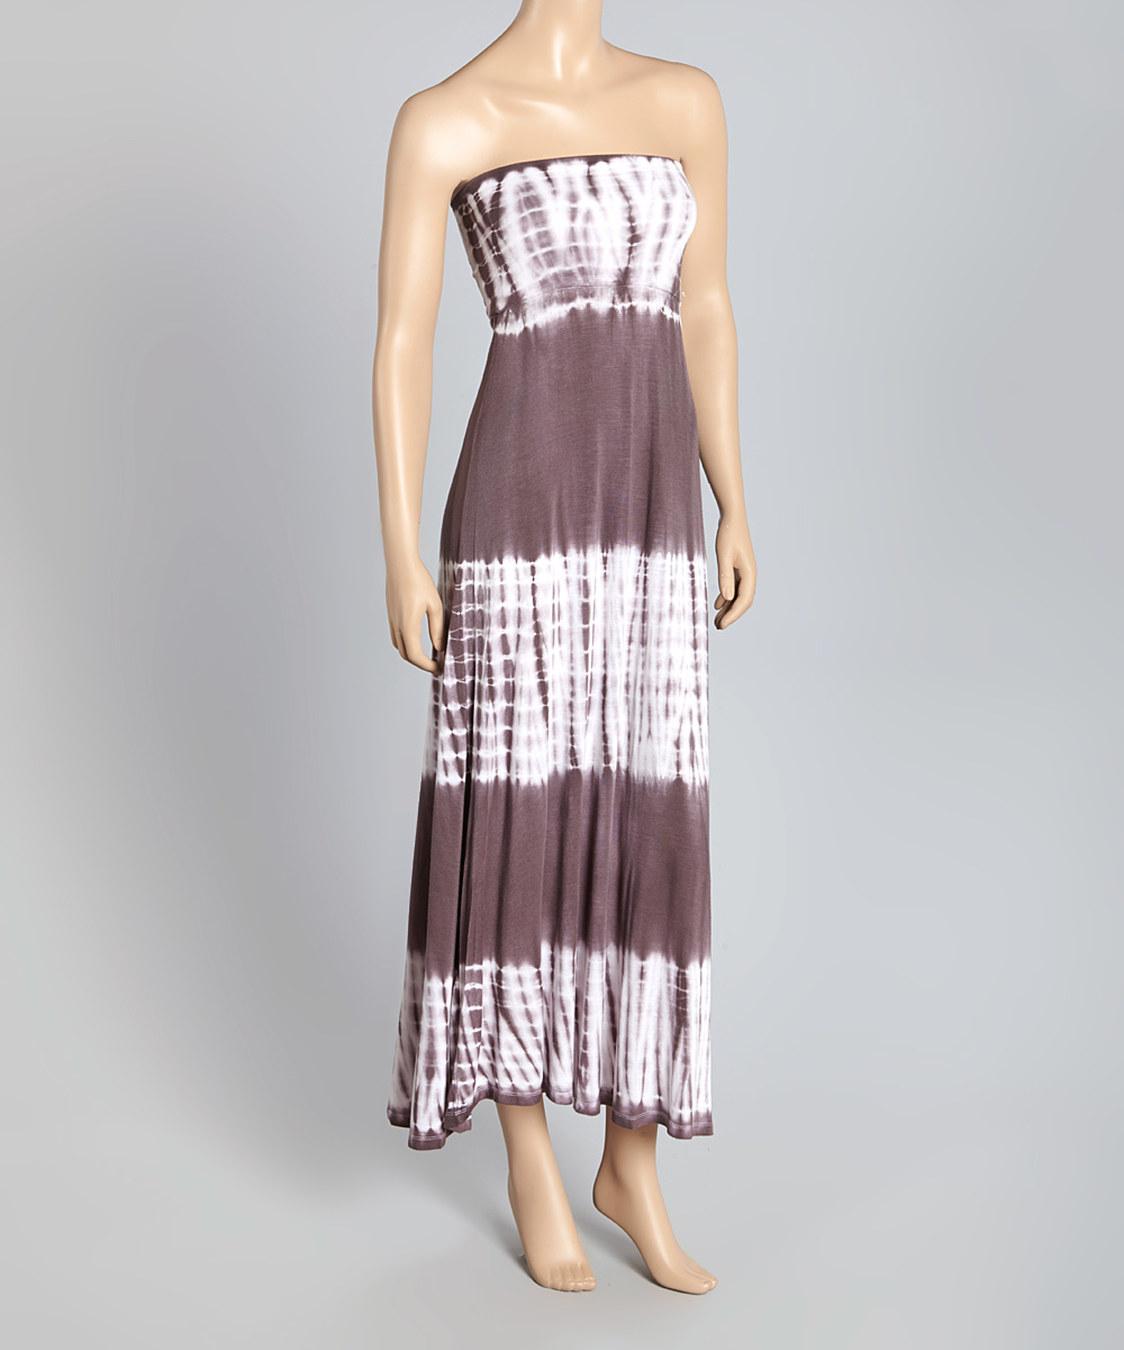 popular basics charcoal tie dye convertible maxi skirt